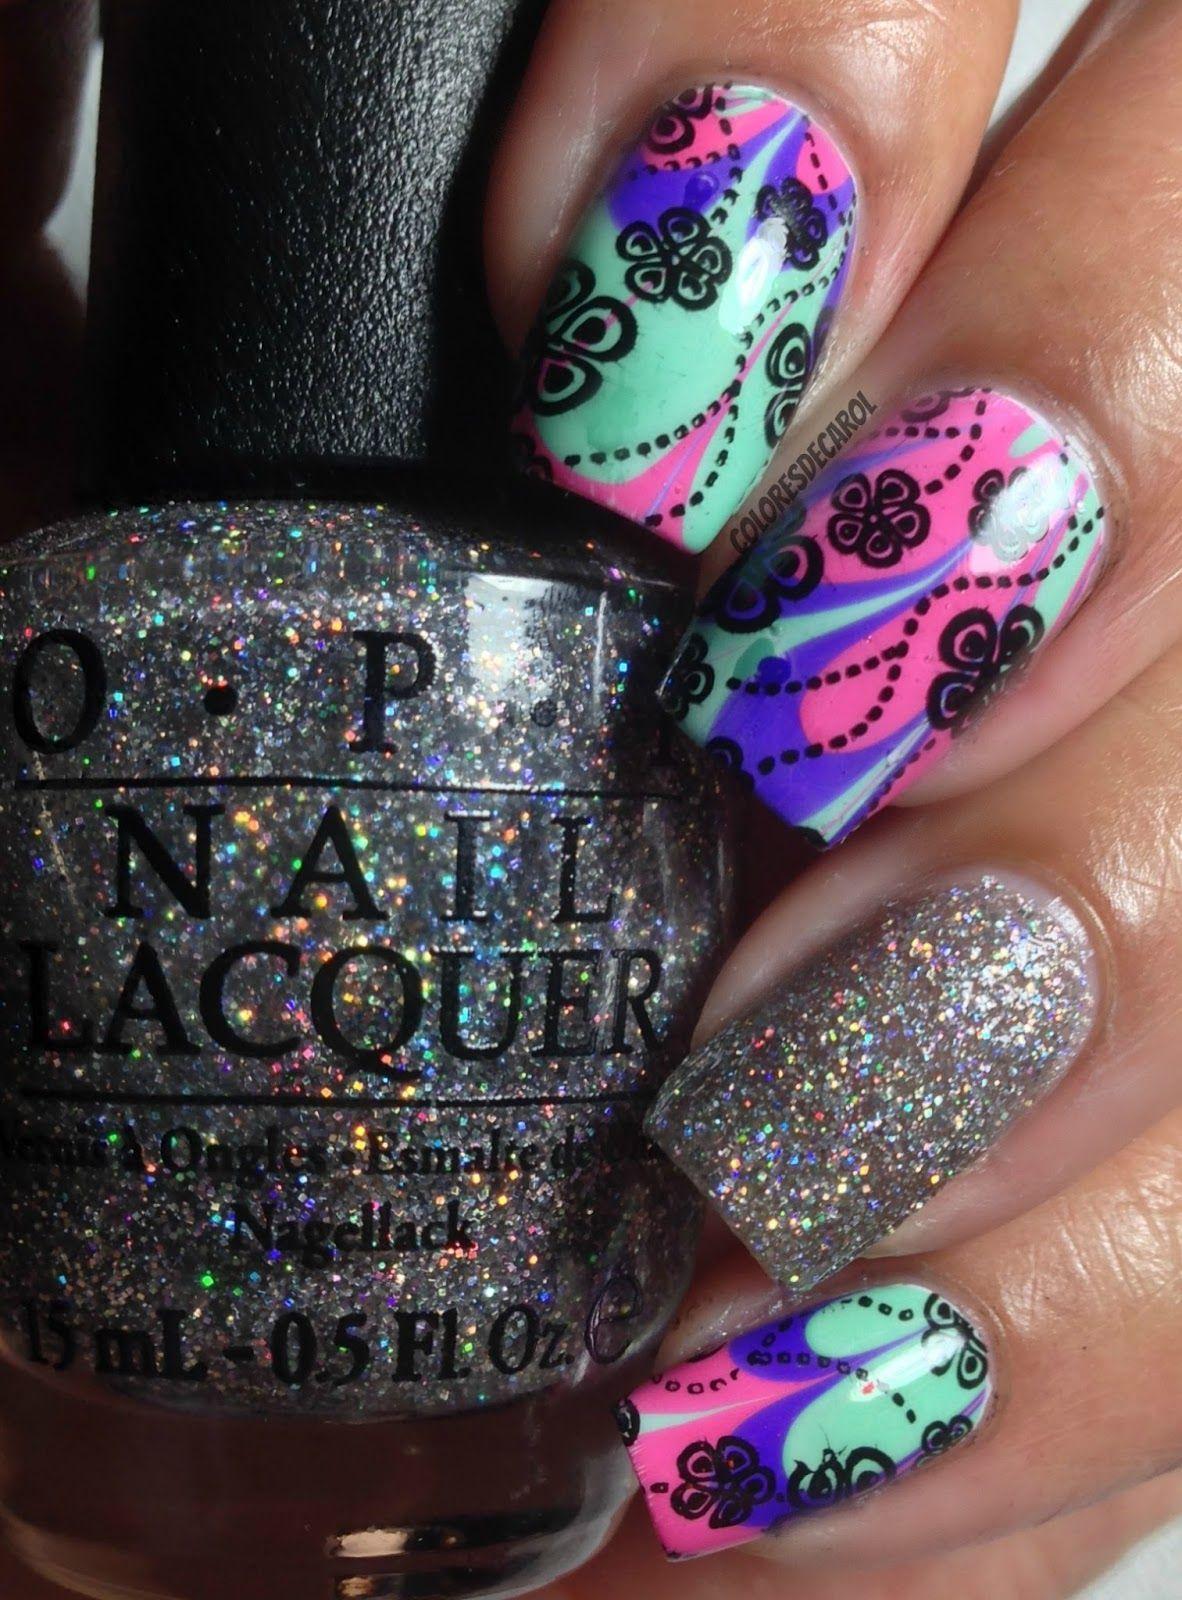 Colores de Carol: Nordic Nail Art